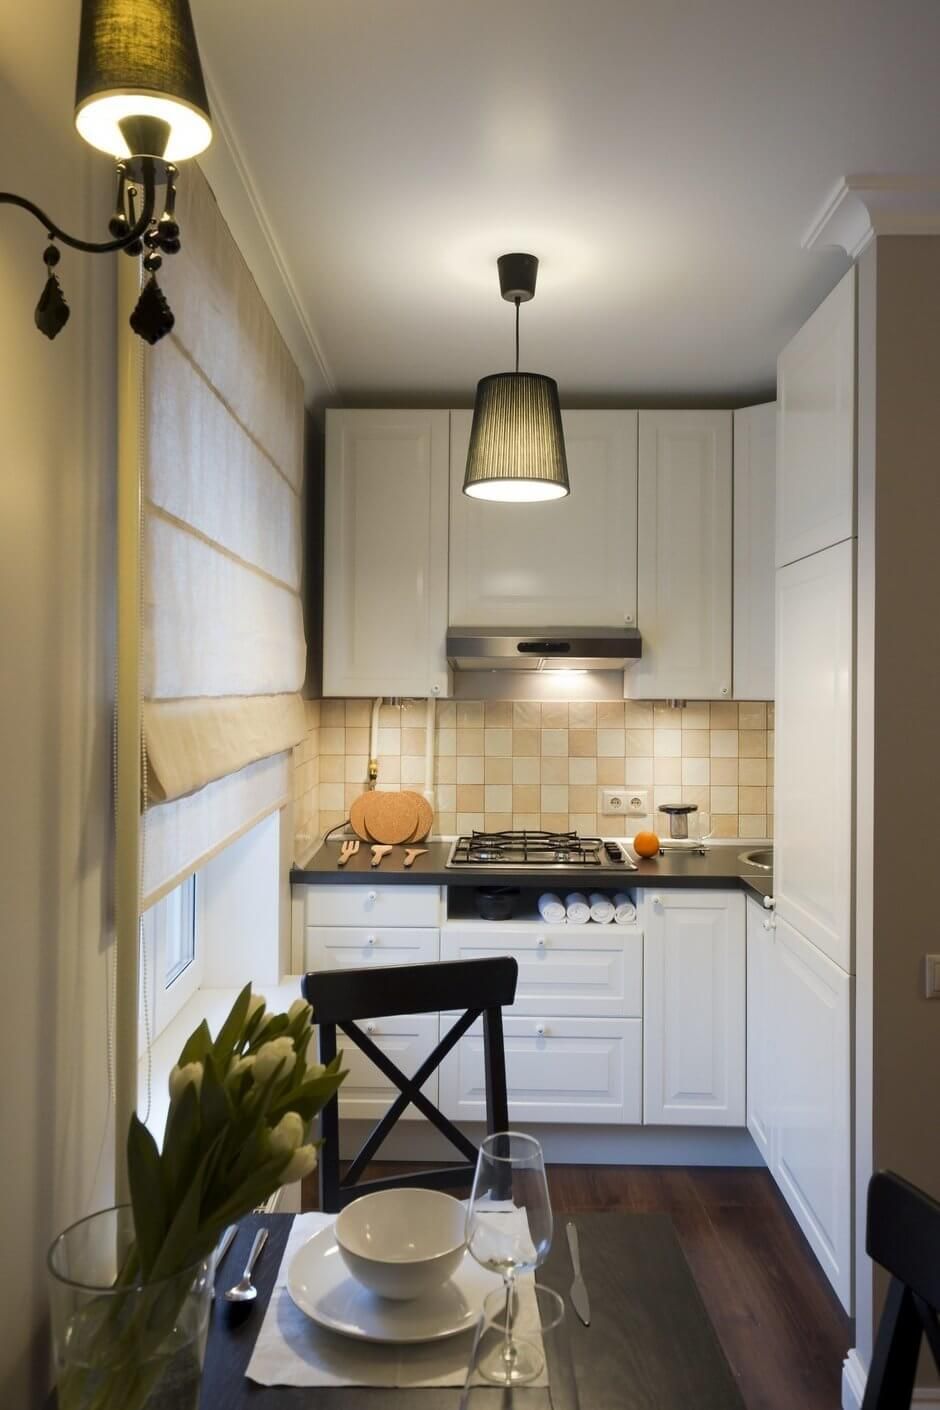 интерьер кухни 7 кв м фото